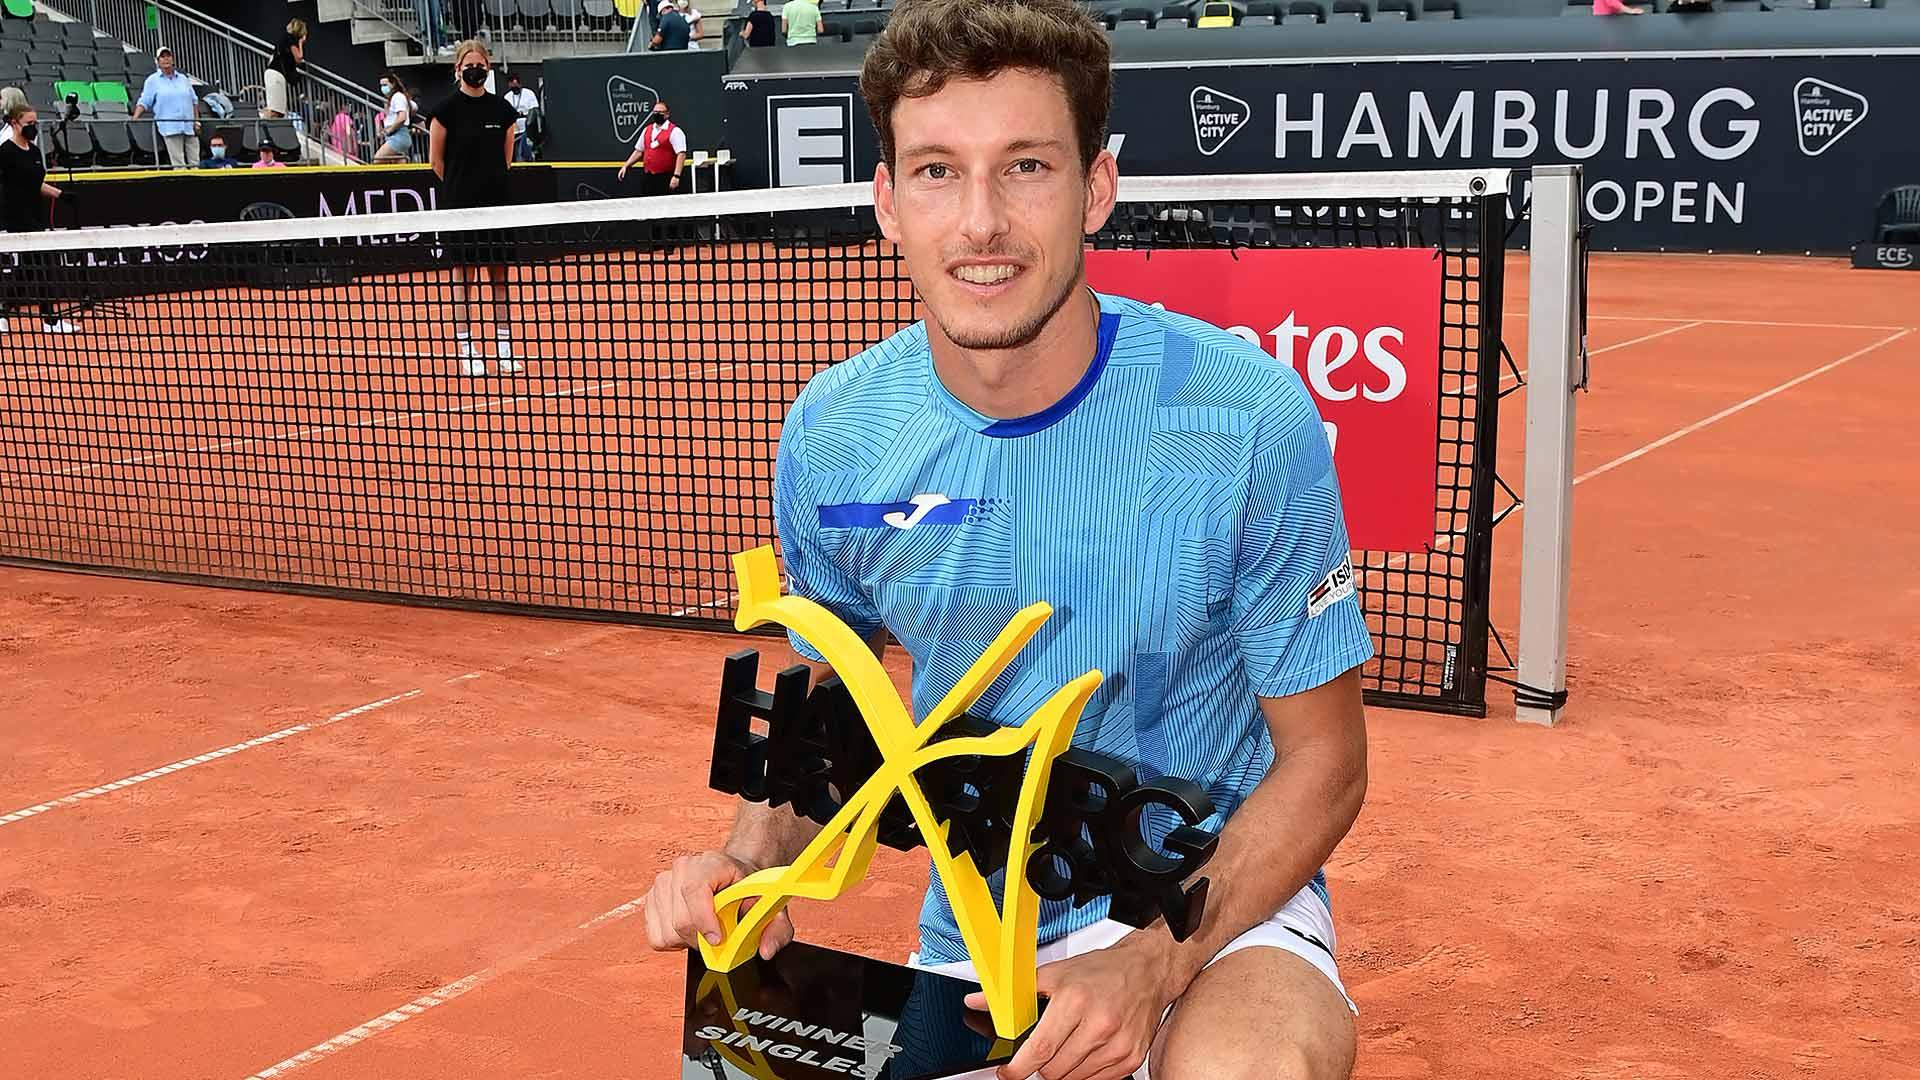 carreno busta hamburg 2021 trophy - ATP Hamburg: Šesta turnirska zmaga za Španca